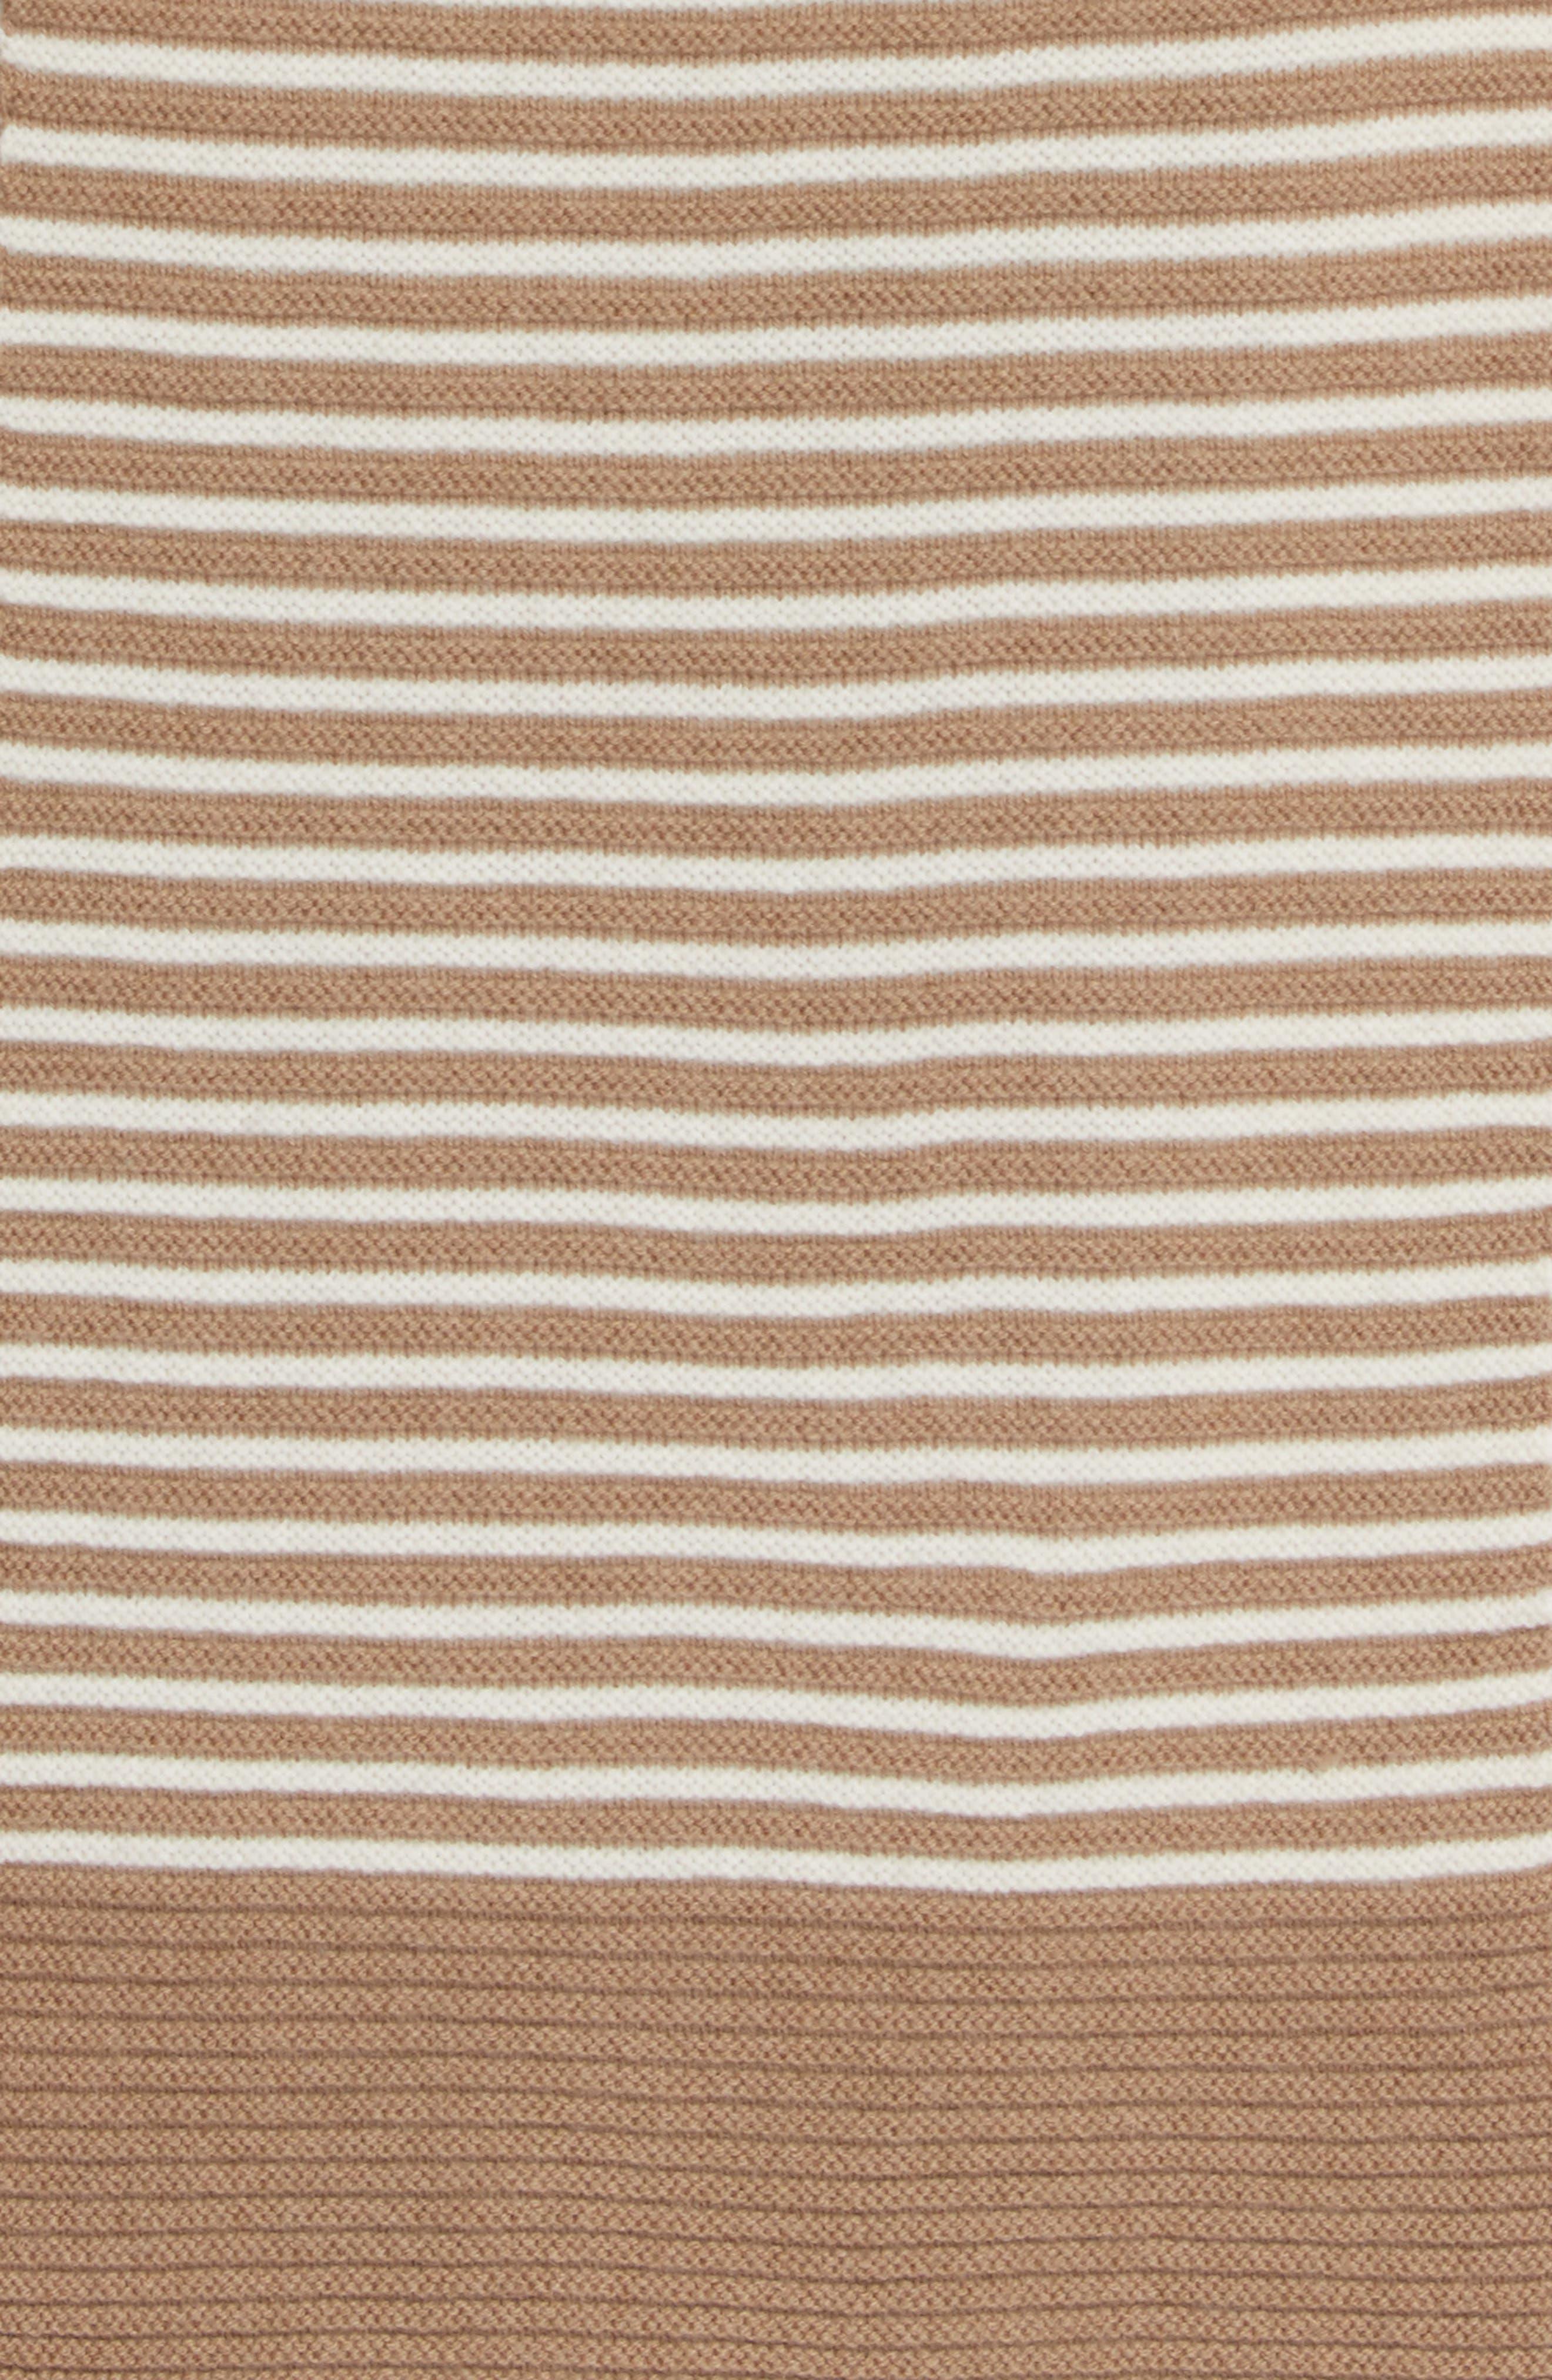 Alternate Image 4  - MICHAEL Michael Kors Double Links Wool & Cashmere Scarf